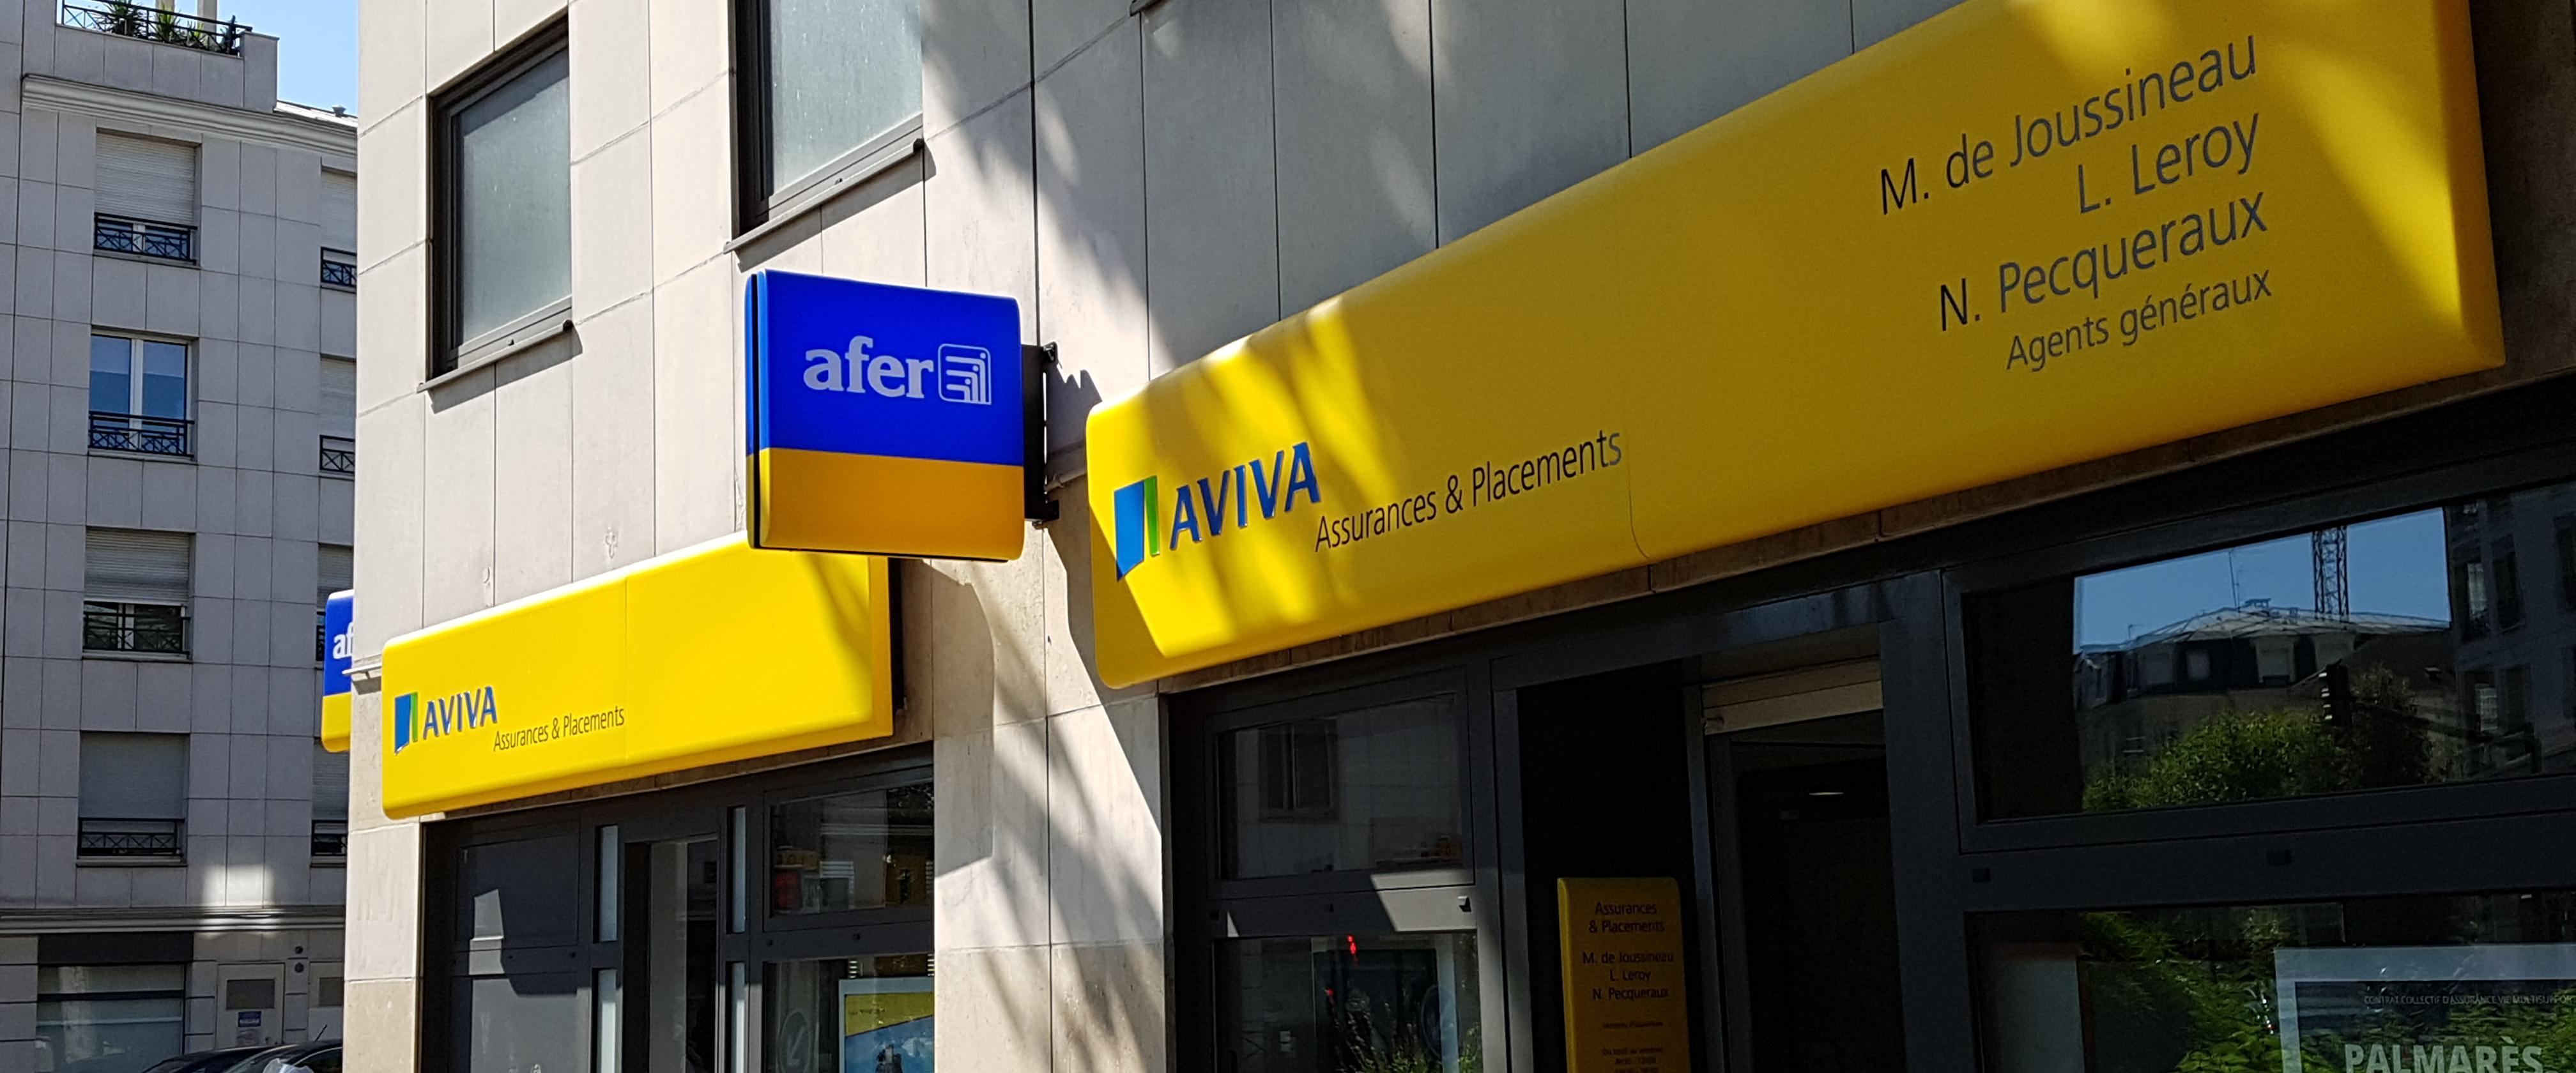 agence assurance LMN Assurances & Patrimoine